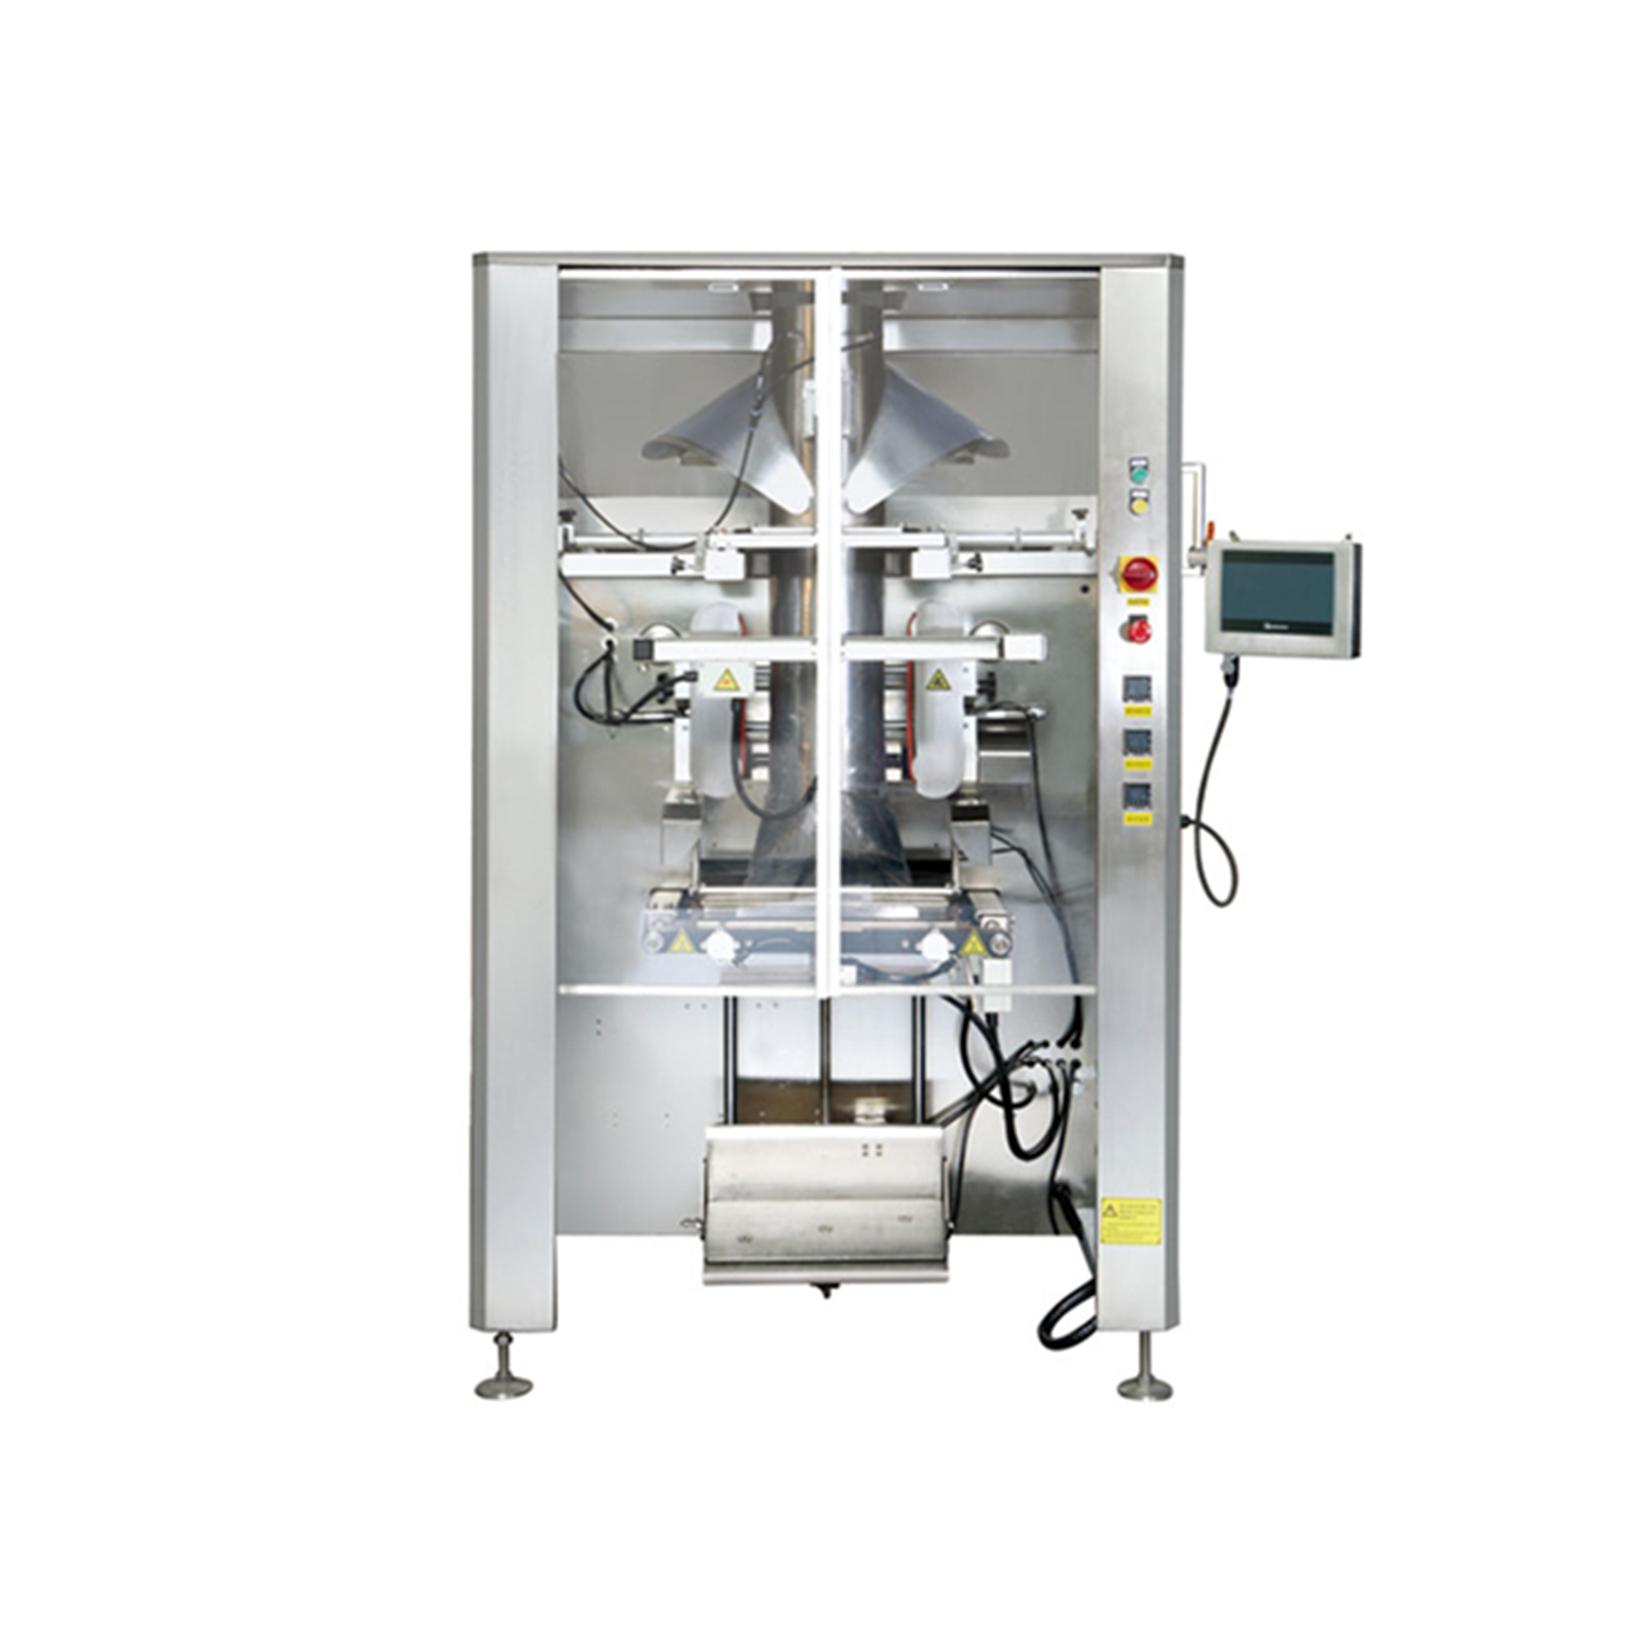 VFFS machine – V450